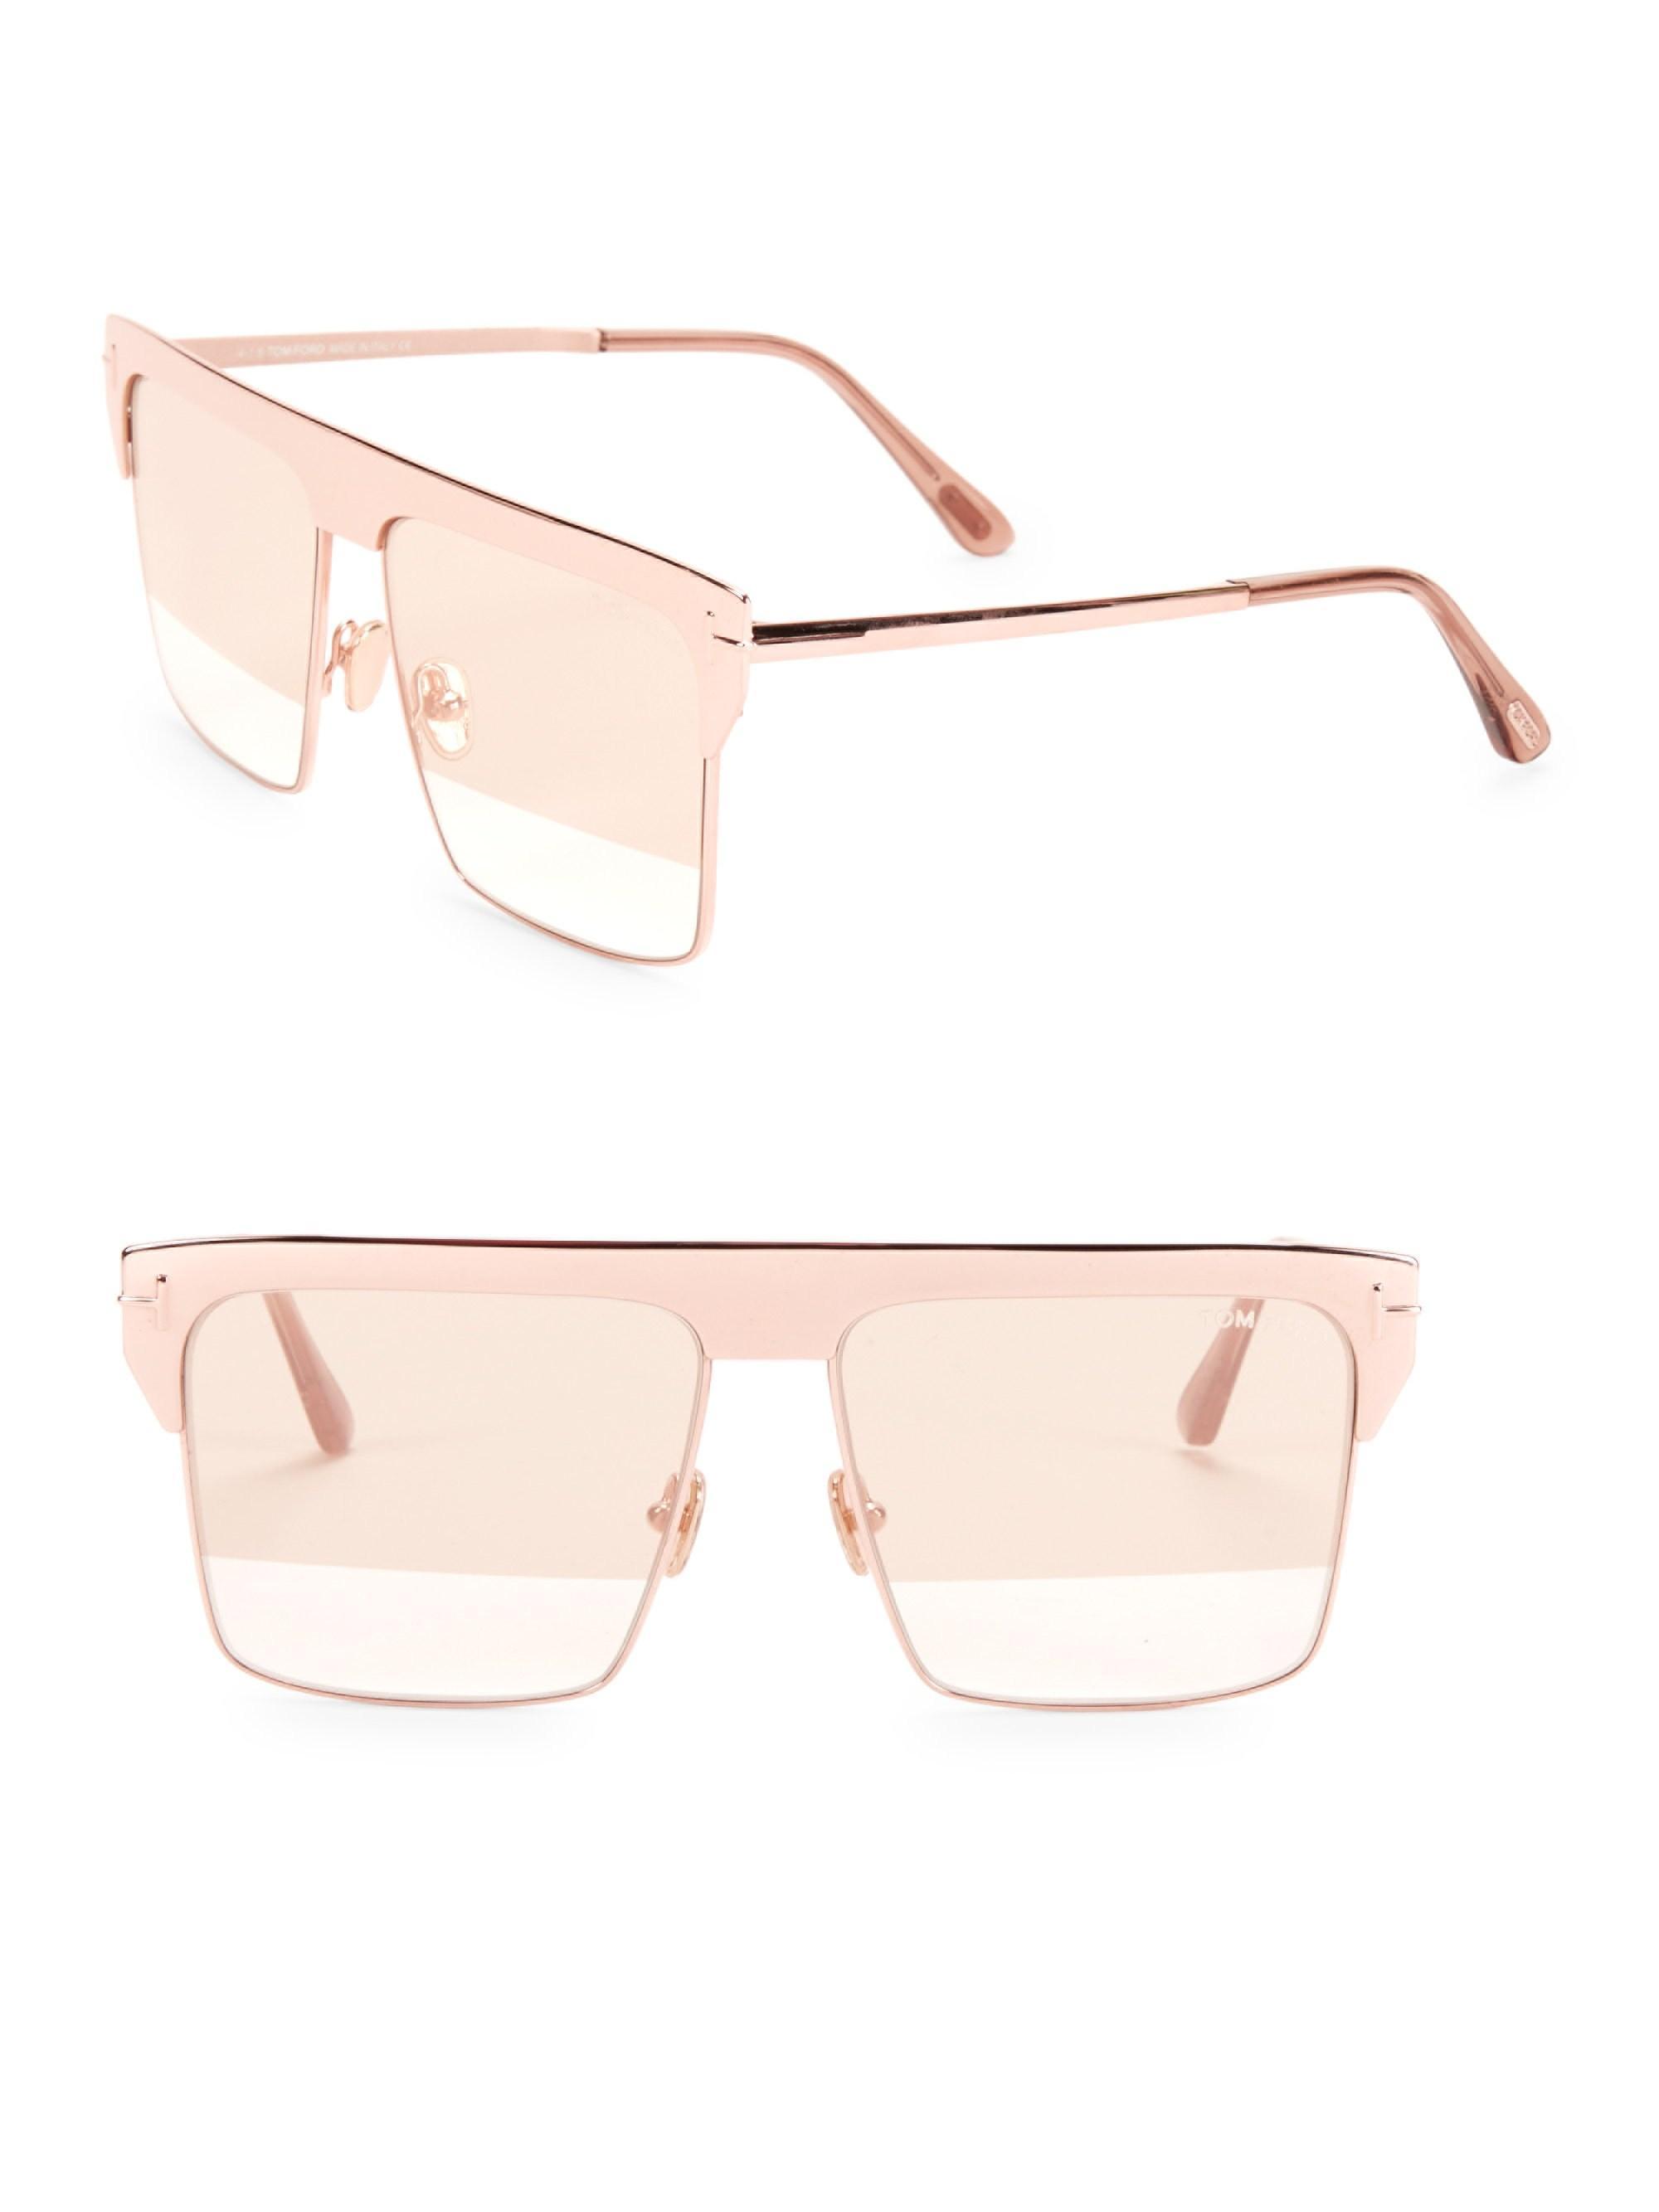 229c74ec6e1 Tom Ford. Women s West 59mm Square Rose Goldplated Sunglasses